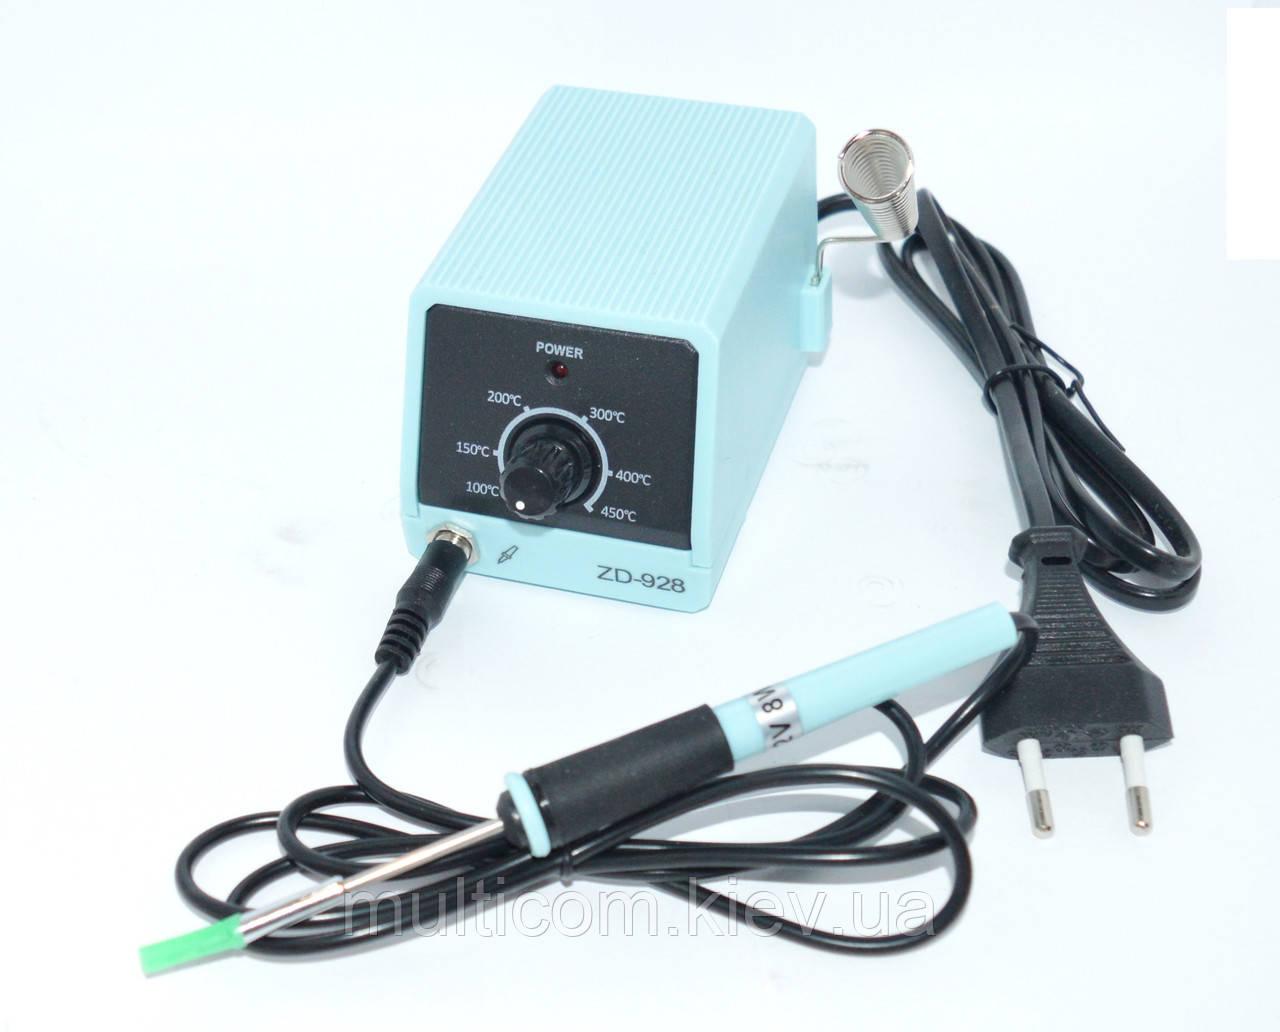 13-00-002. Микропаяльная станция ZD-928, для SMD компоненков, корпус пластик, 8W, 100-450°C